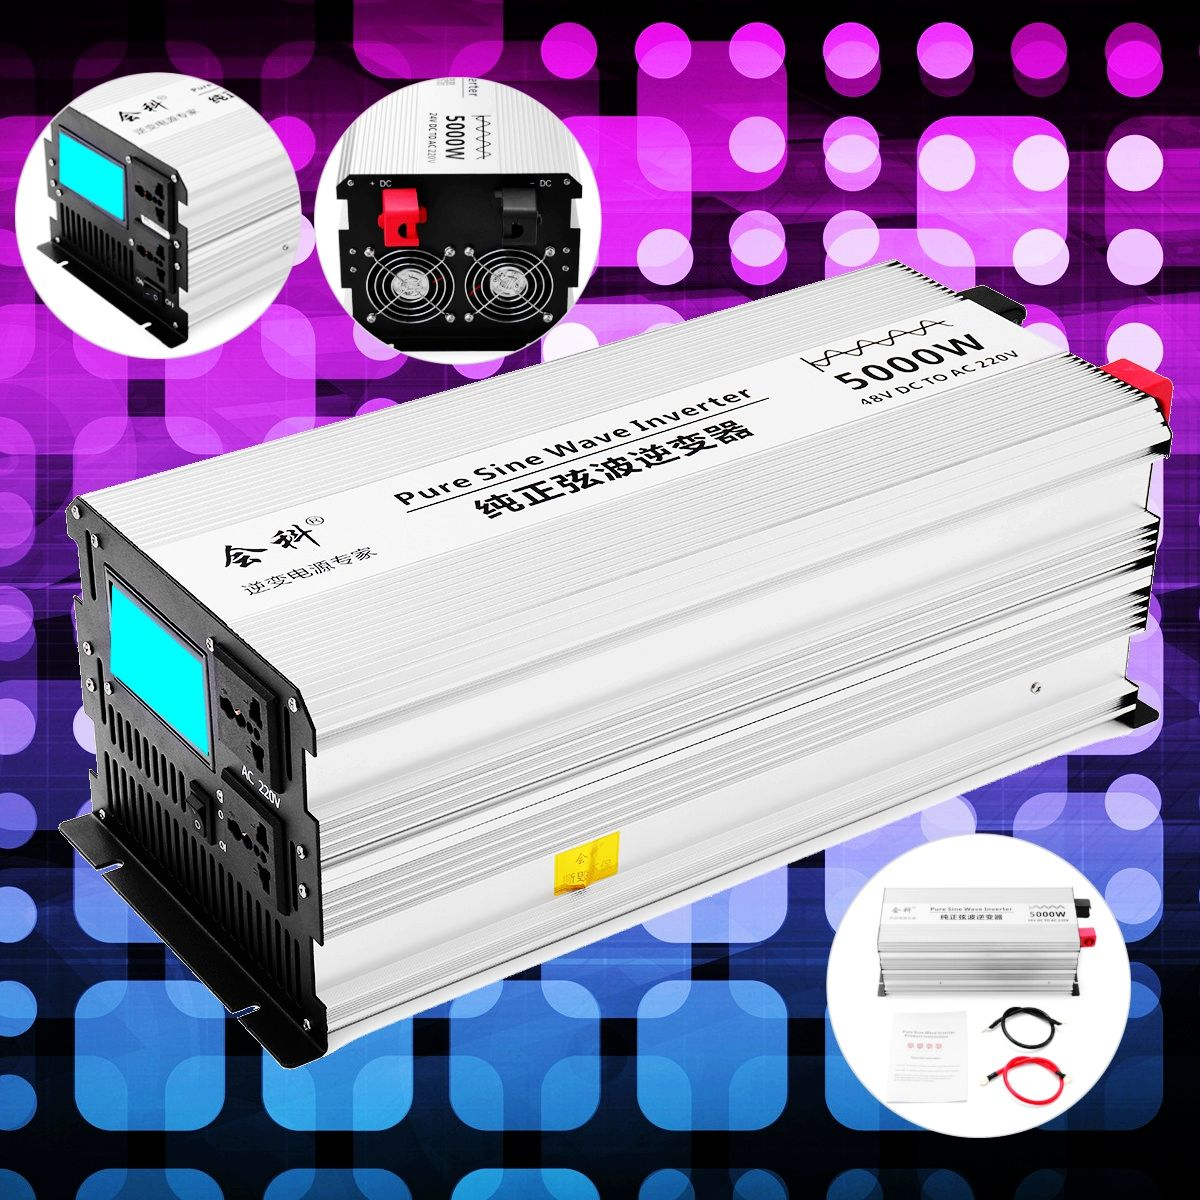 Inverter pure sine wave 2500W 5000W P eak 50Hz DC 12V/24V/48V to AC 110V/220V Voltage Transformer Converte LCD display Inverter